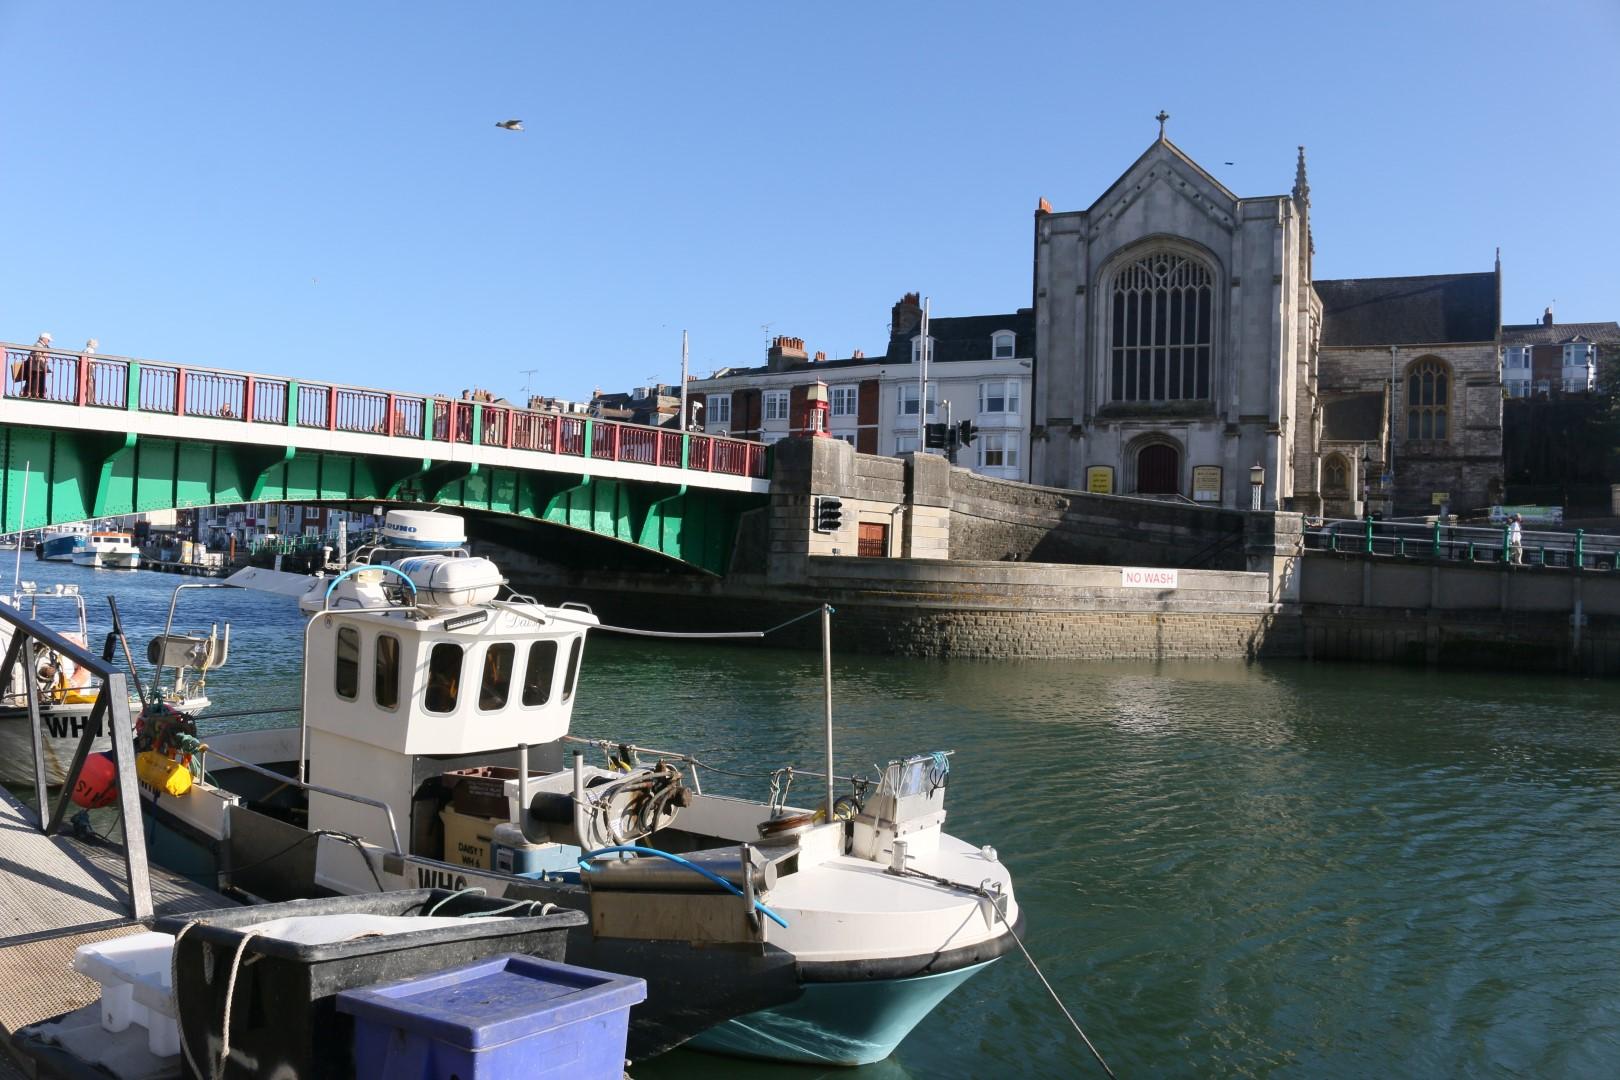 Holy Trinity Weymouth with St Nicholas